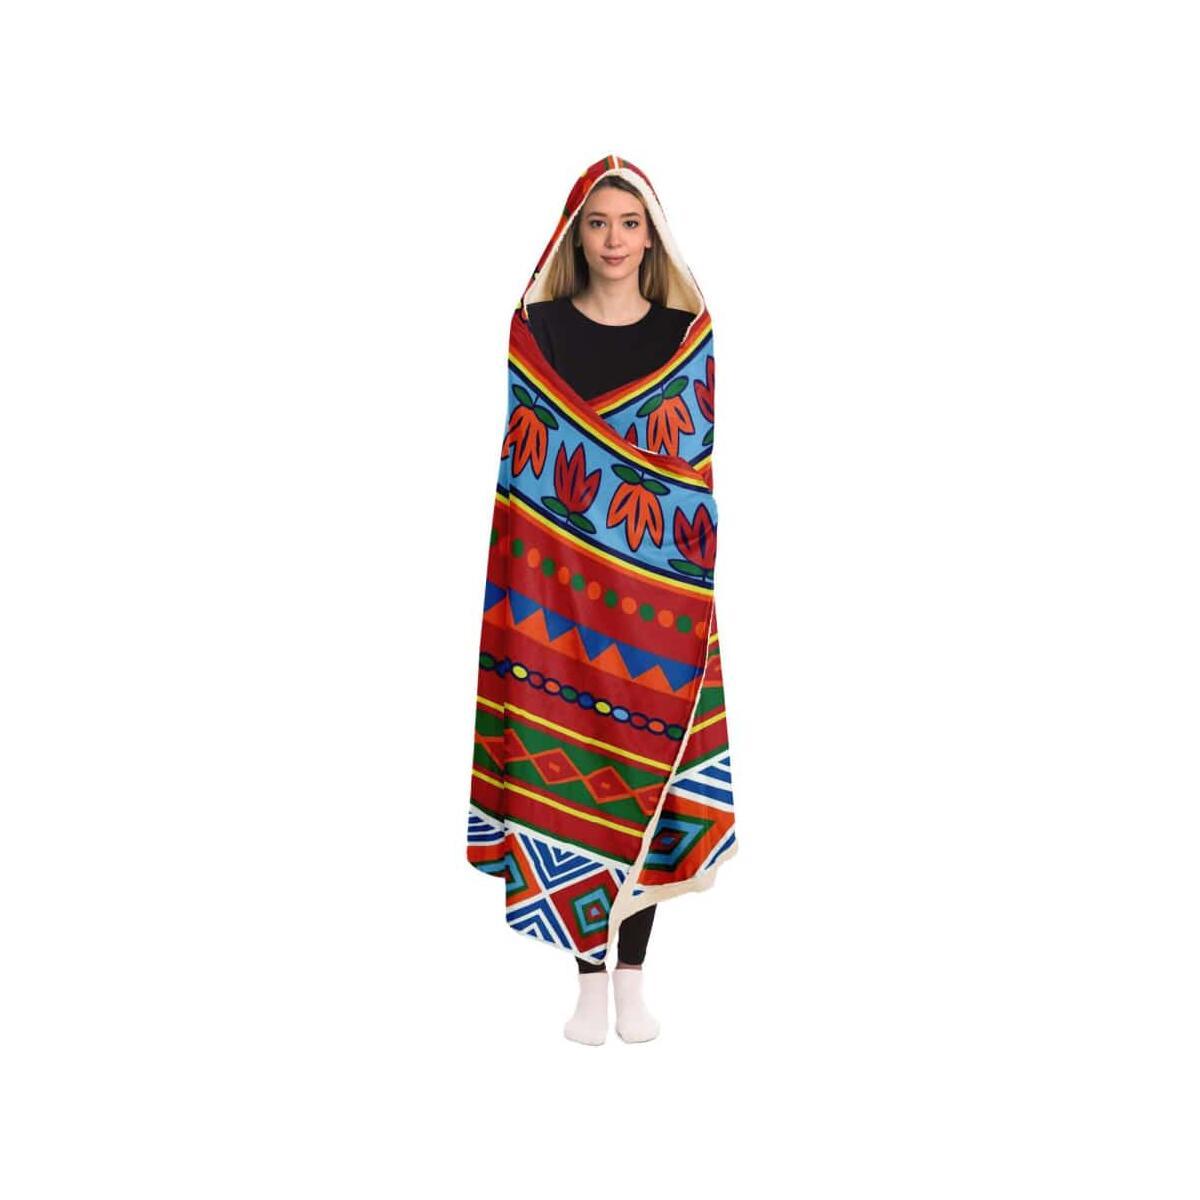 African Lotus Hooded Blanket, Adult / Micro Fleece